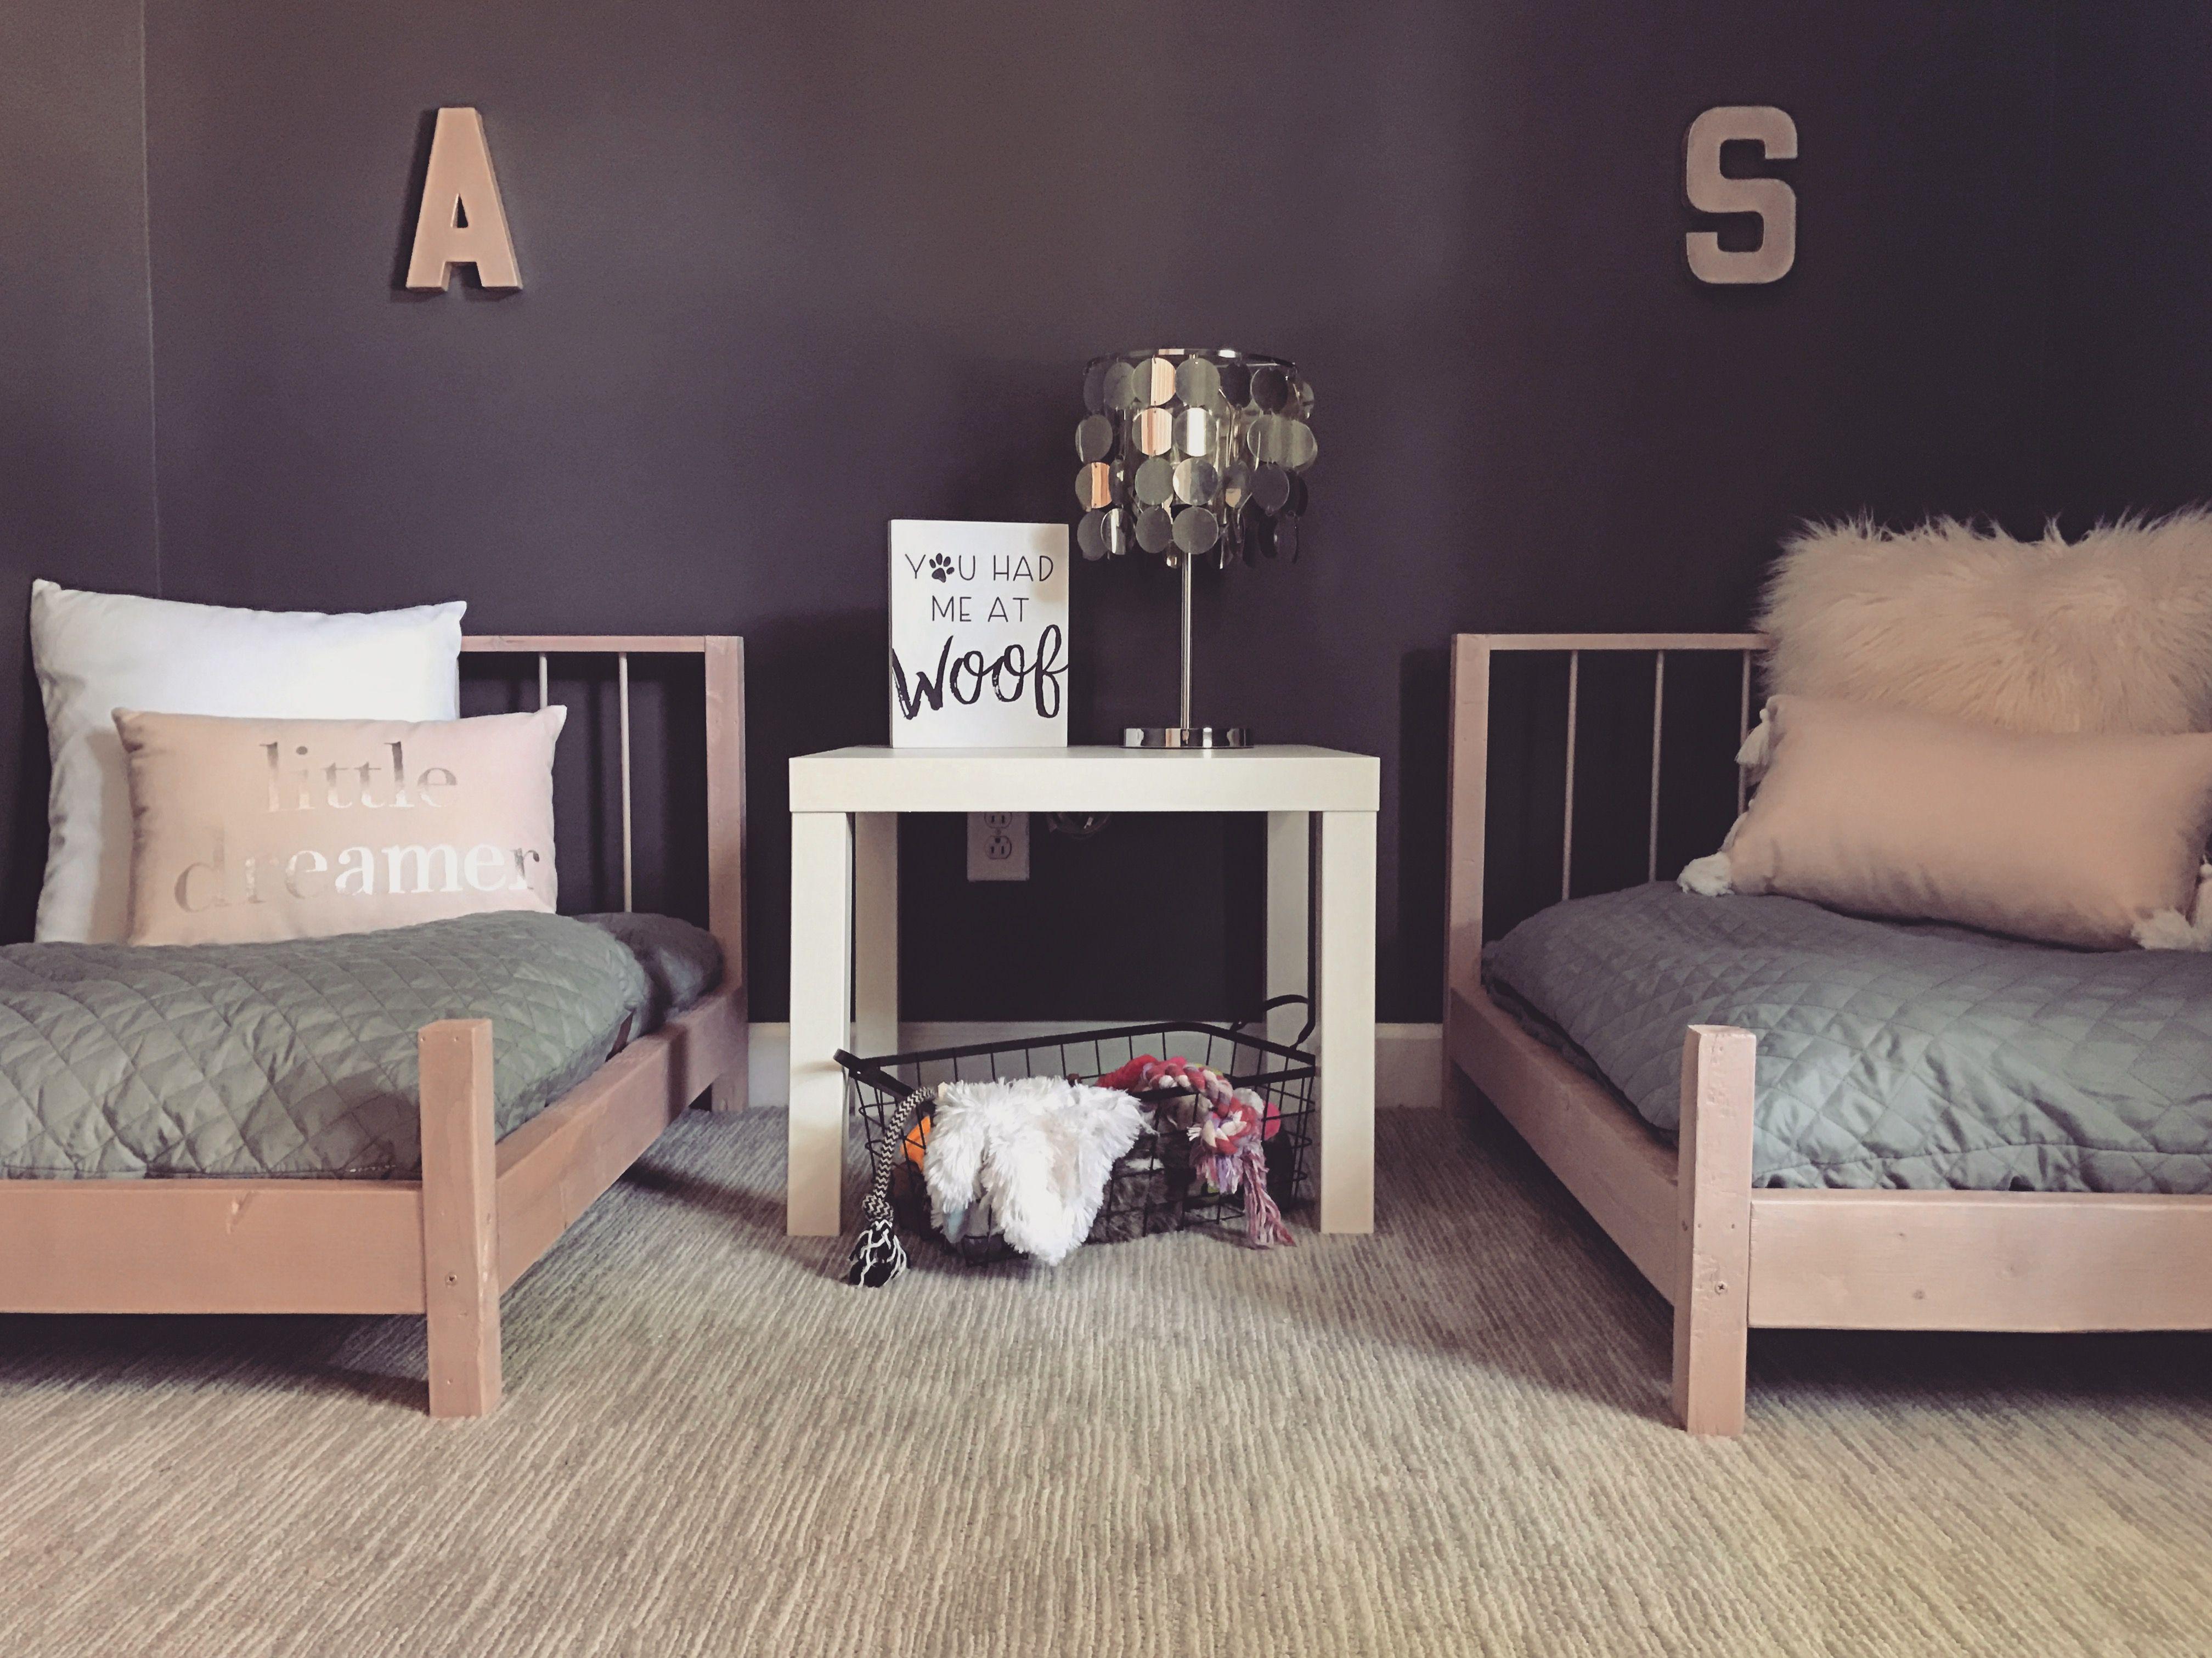 Dog Bedroom Diy Dog Beds Charcoal And Rose Quartz Bedroom Grey And